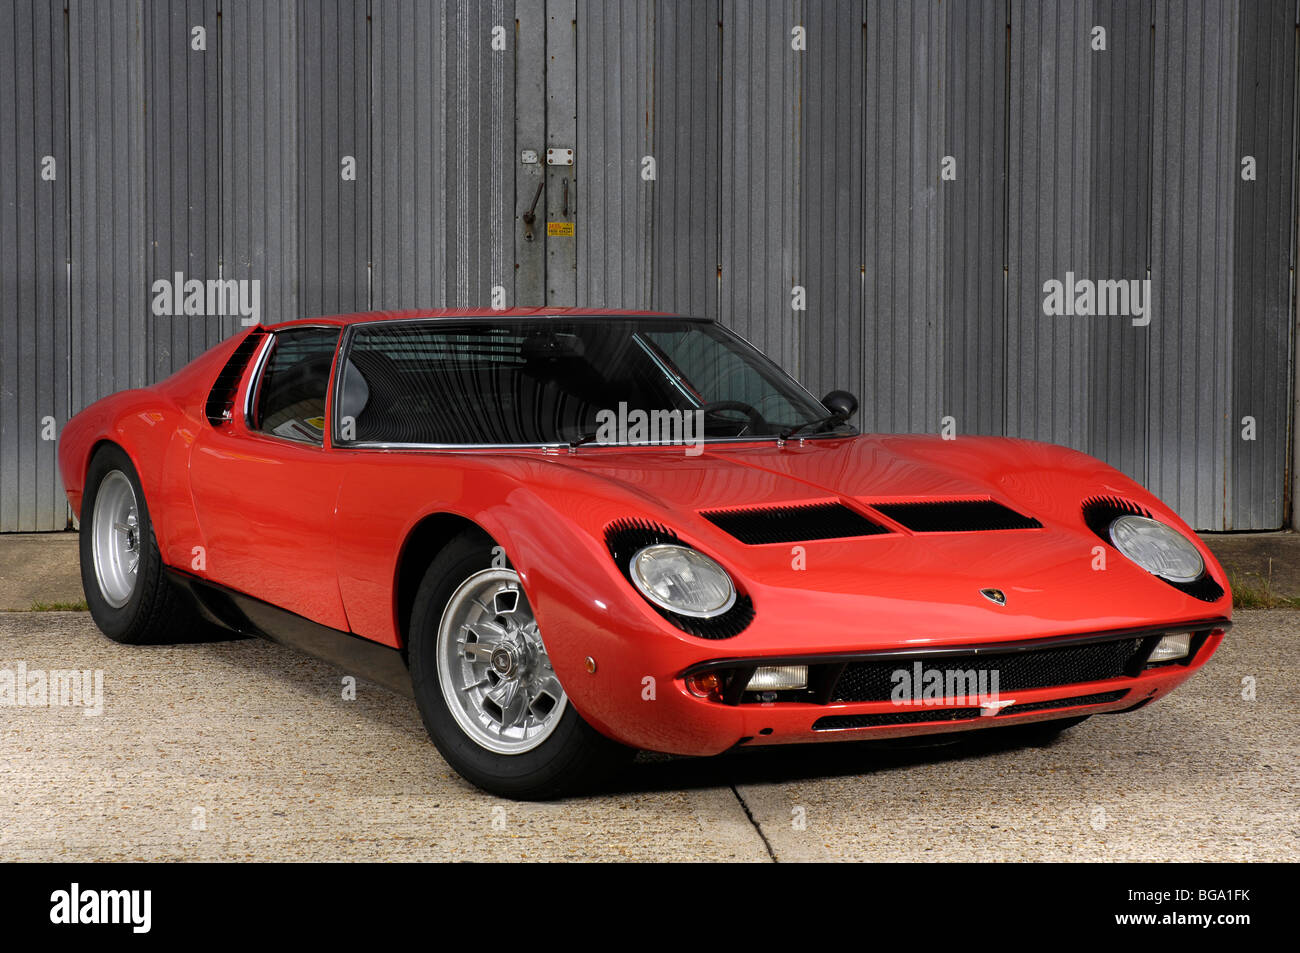 1969 Lamborghini Muira P400 S - Stock Image